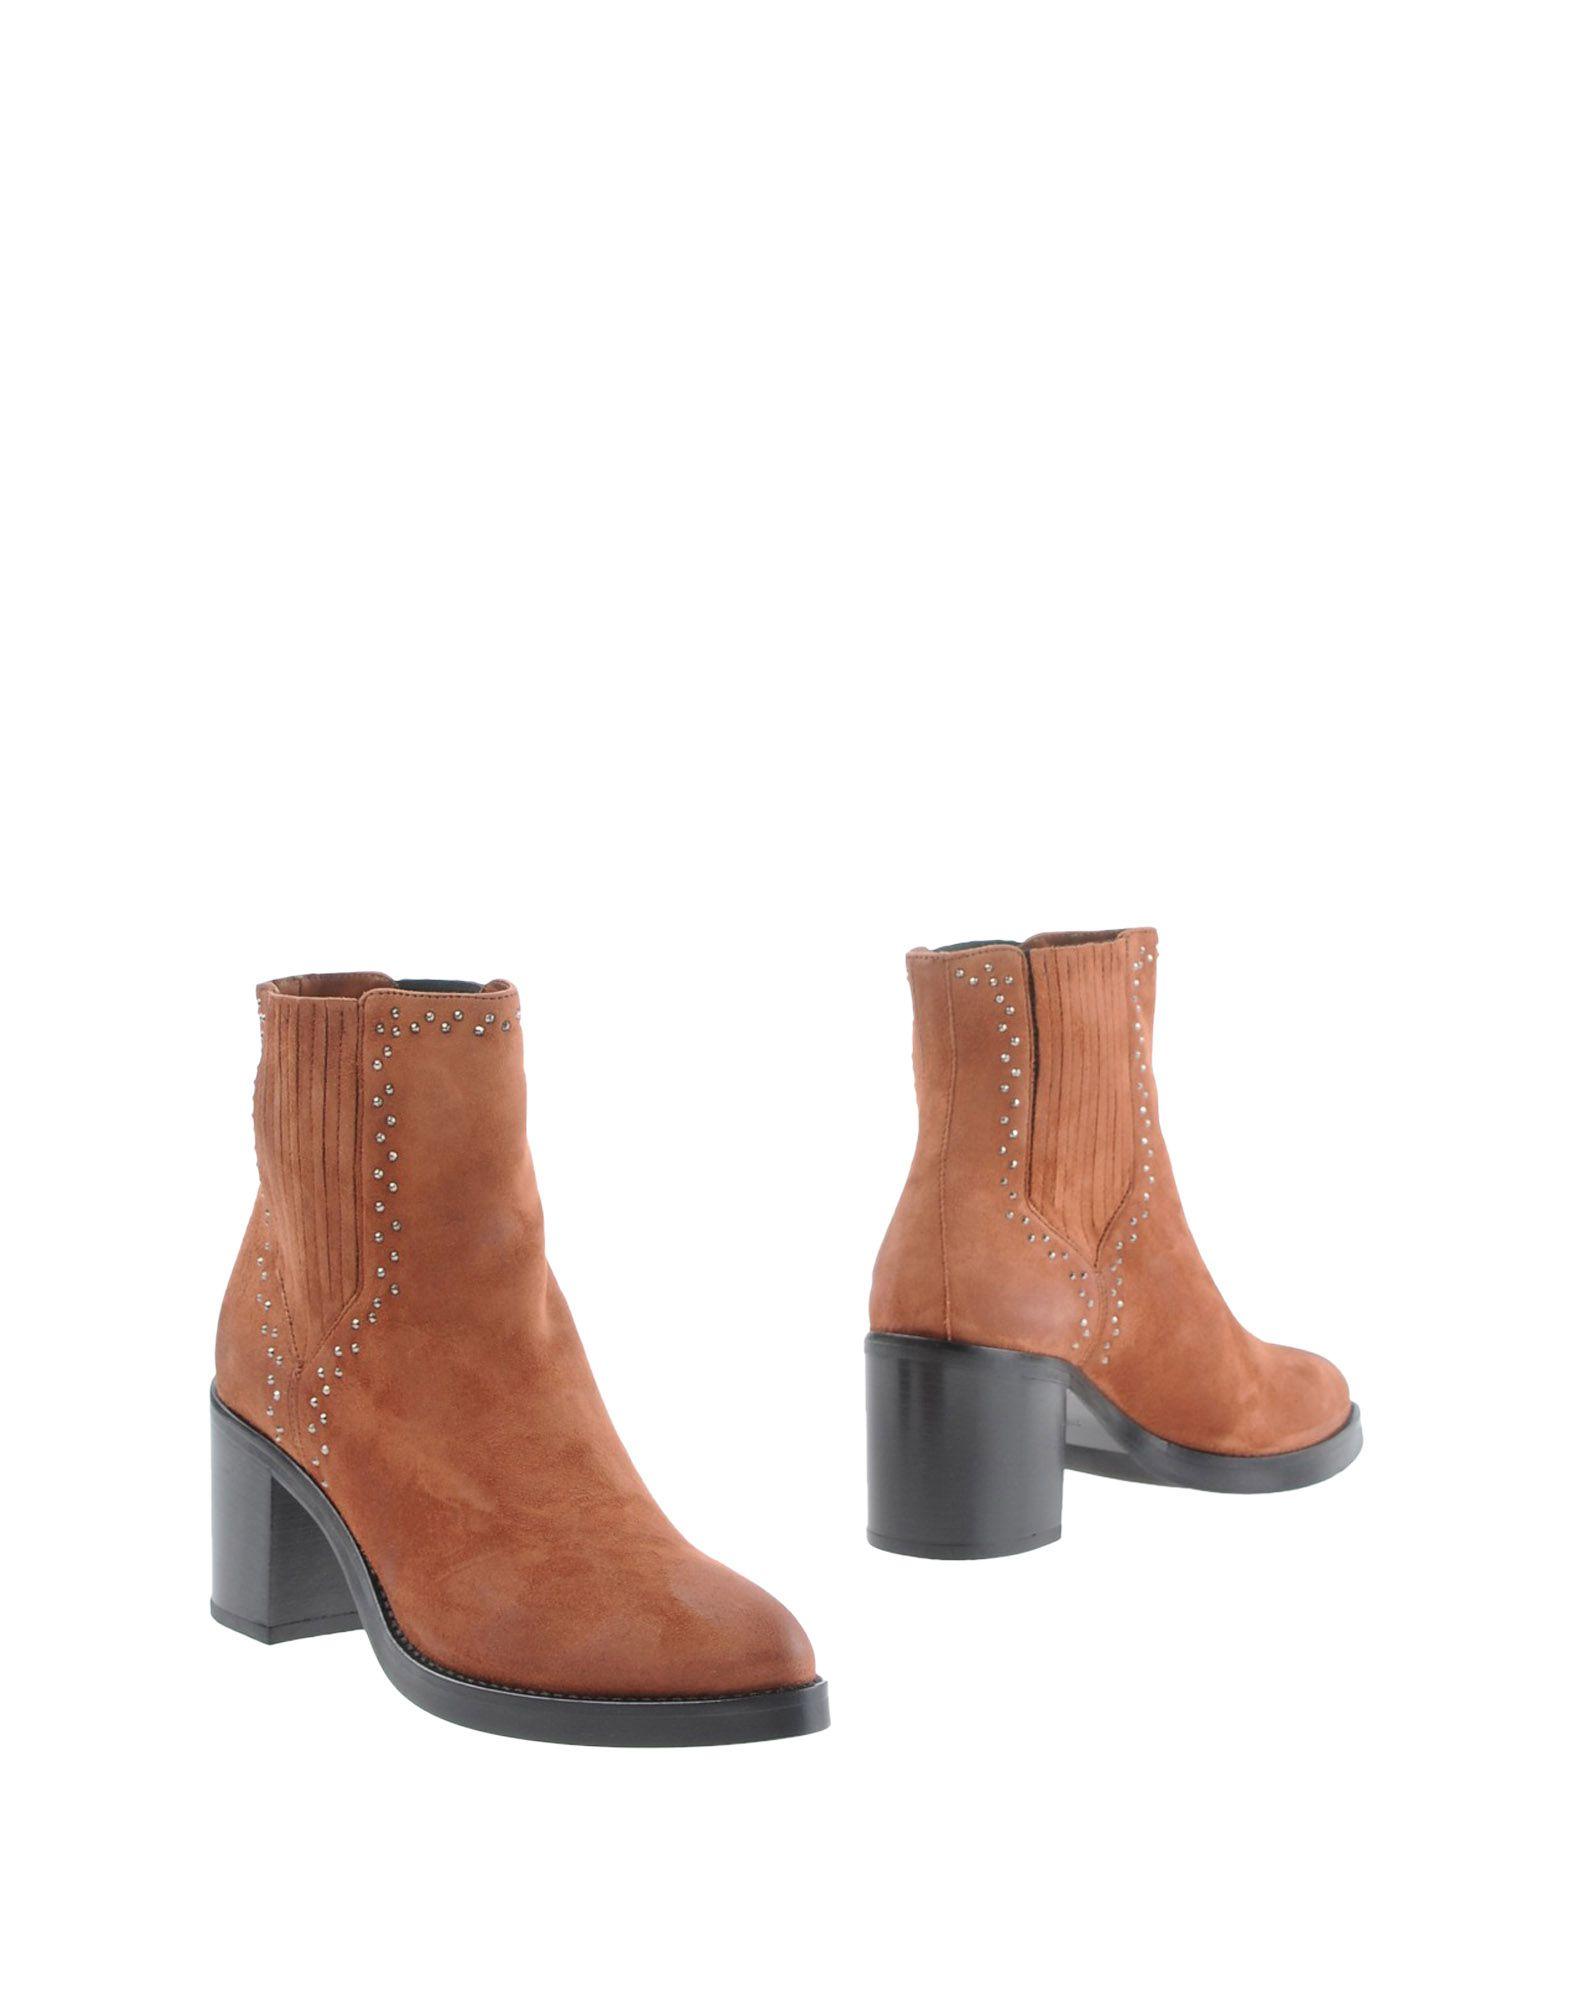 ФОТО janet & janet Полусапоги и высокие ботинки